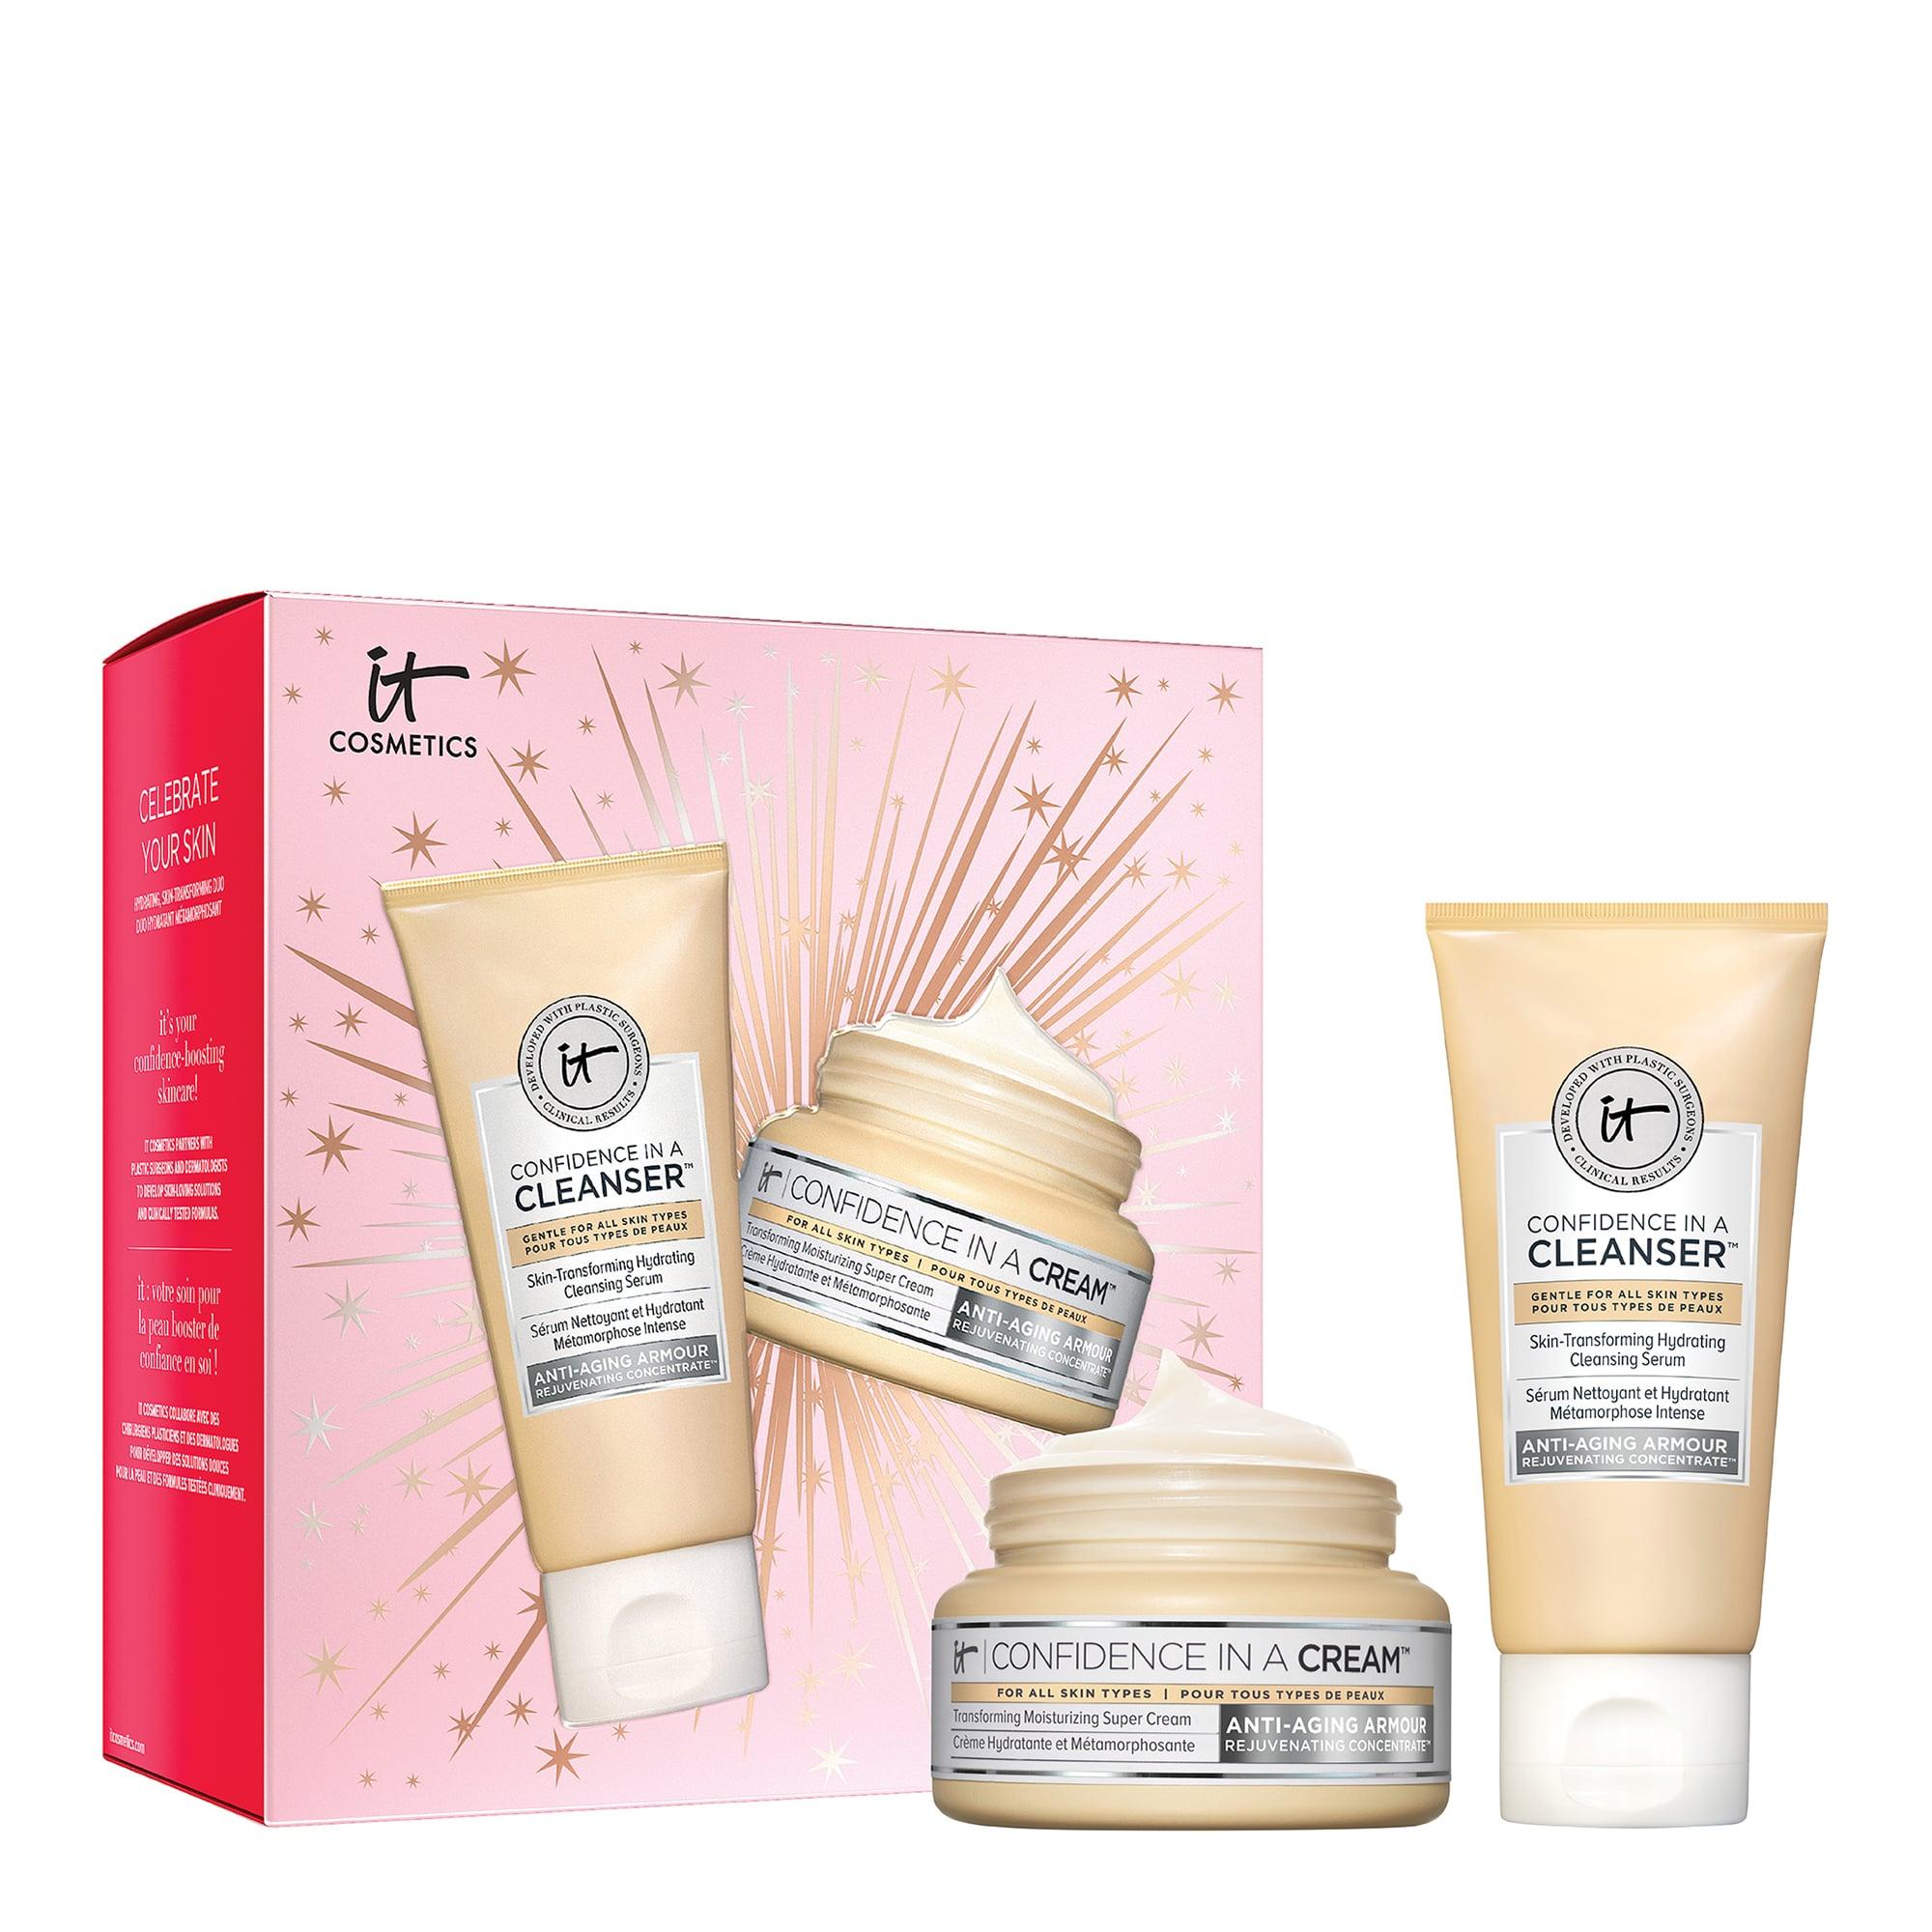 It Cosmetics Celebrate Your Skin Gift Set Best Boots Beauty Gift Sets 2020 Popsugar Beauty Uk Photo 9